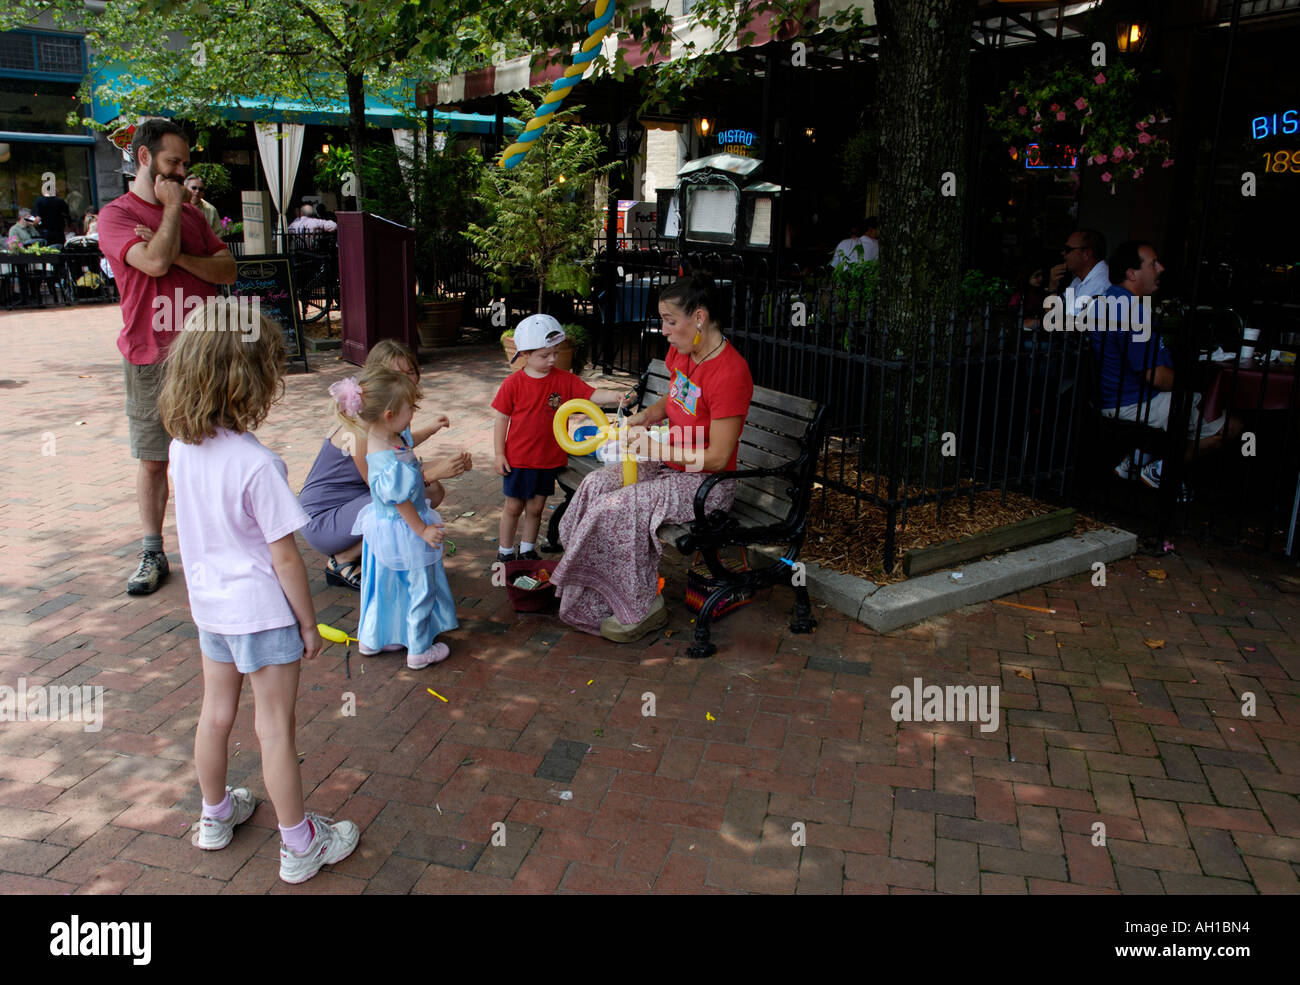 Street artist makes balloon animals for children on sidewalk, Asheville, North Carolina - Stock Image